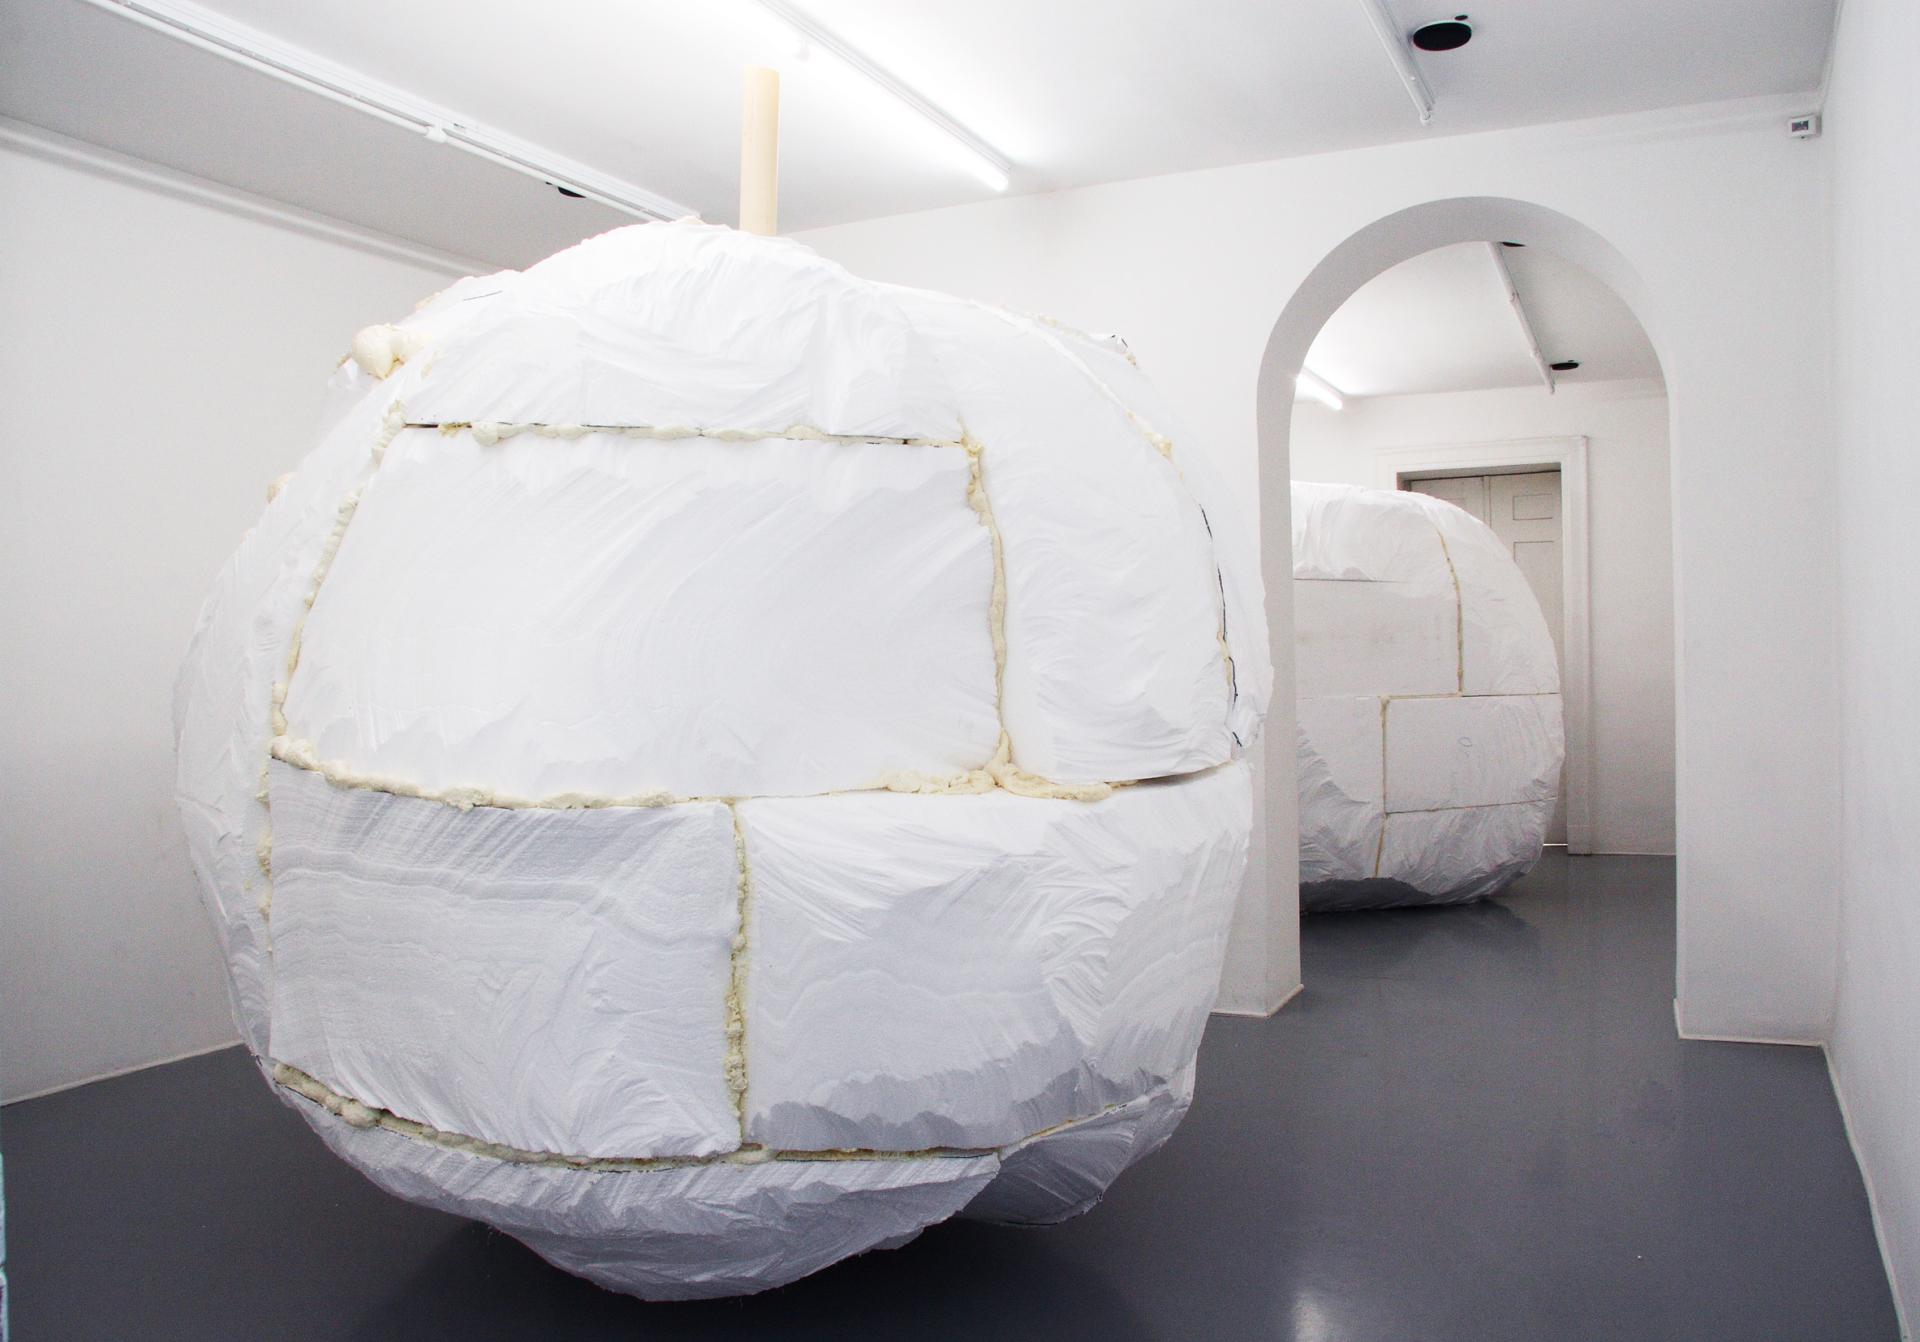 Galleria Fonti ERIC WESLEY – You say tomato, I say tomato